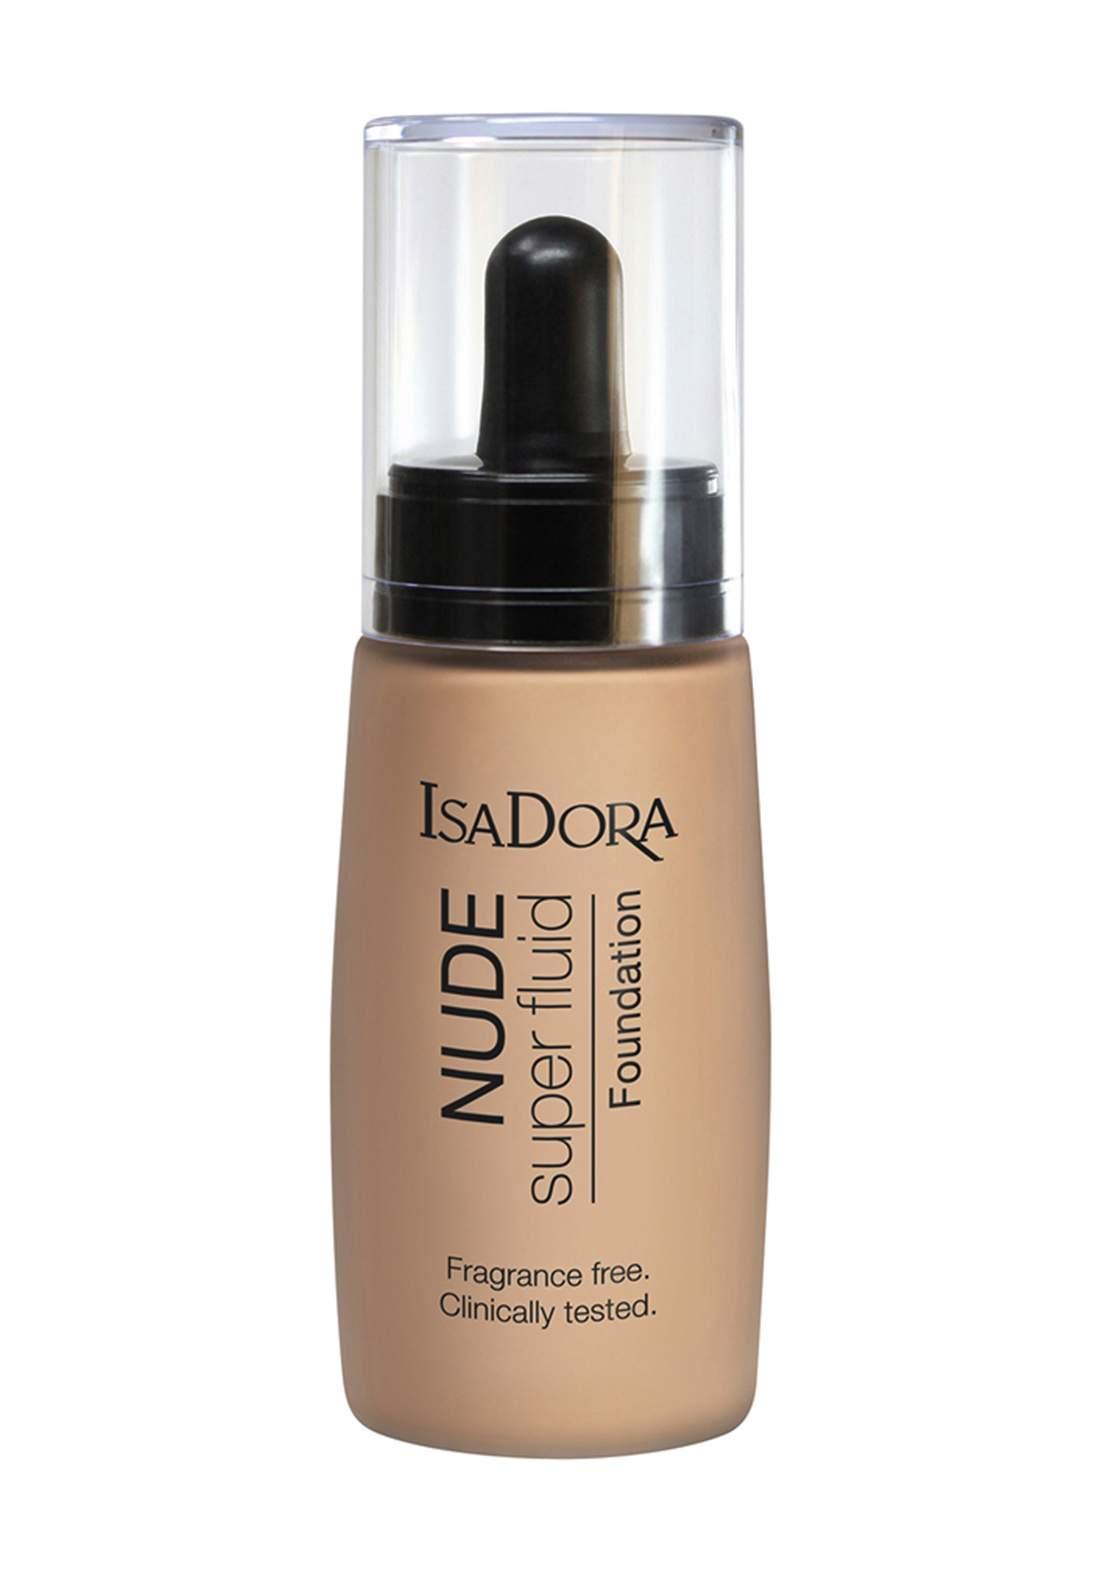 IsaDora 314296 Nude Super Fluid Foundation - Nude Vanilla 30 ML كريم اساس